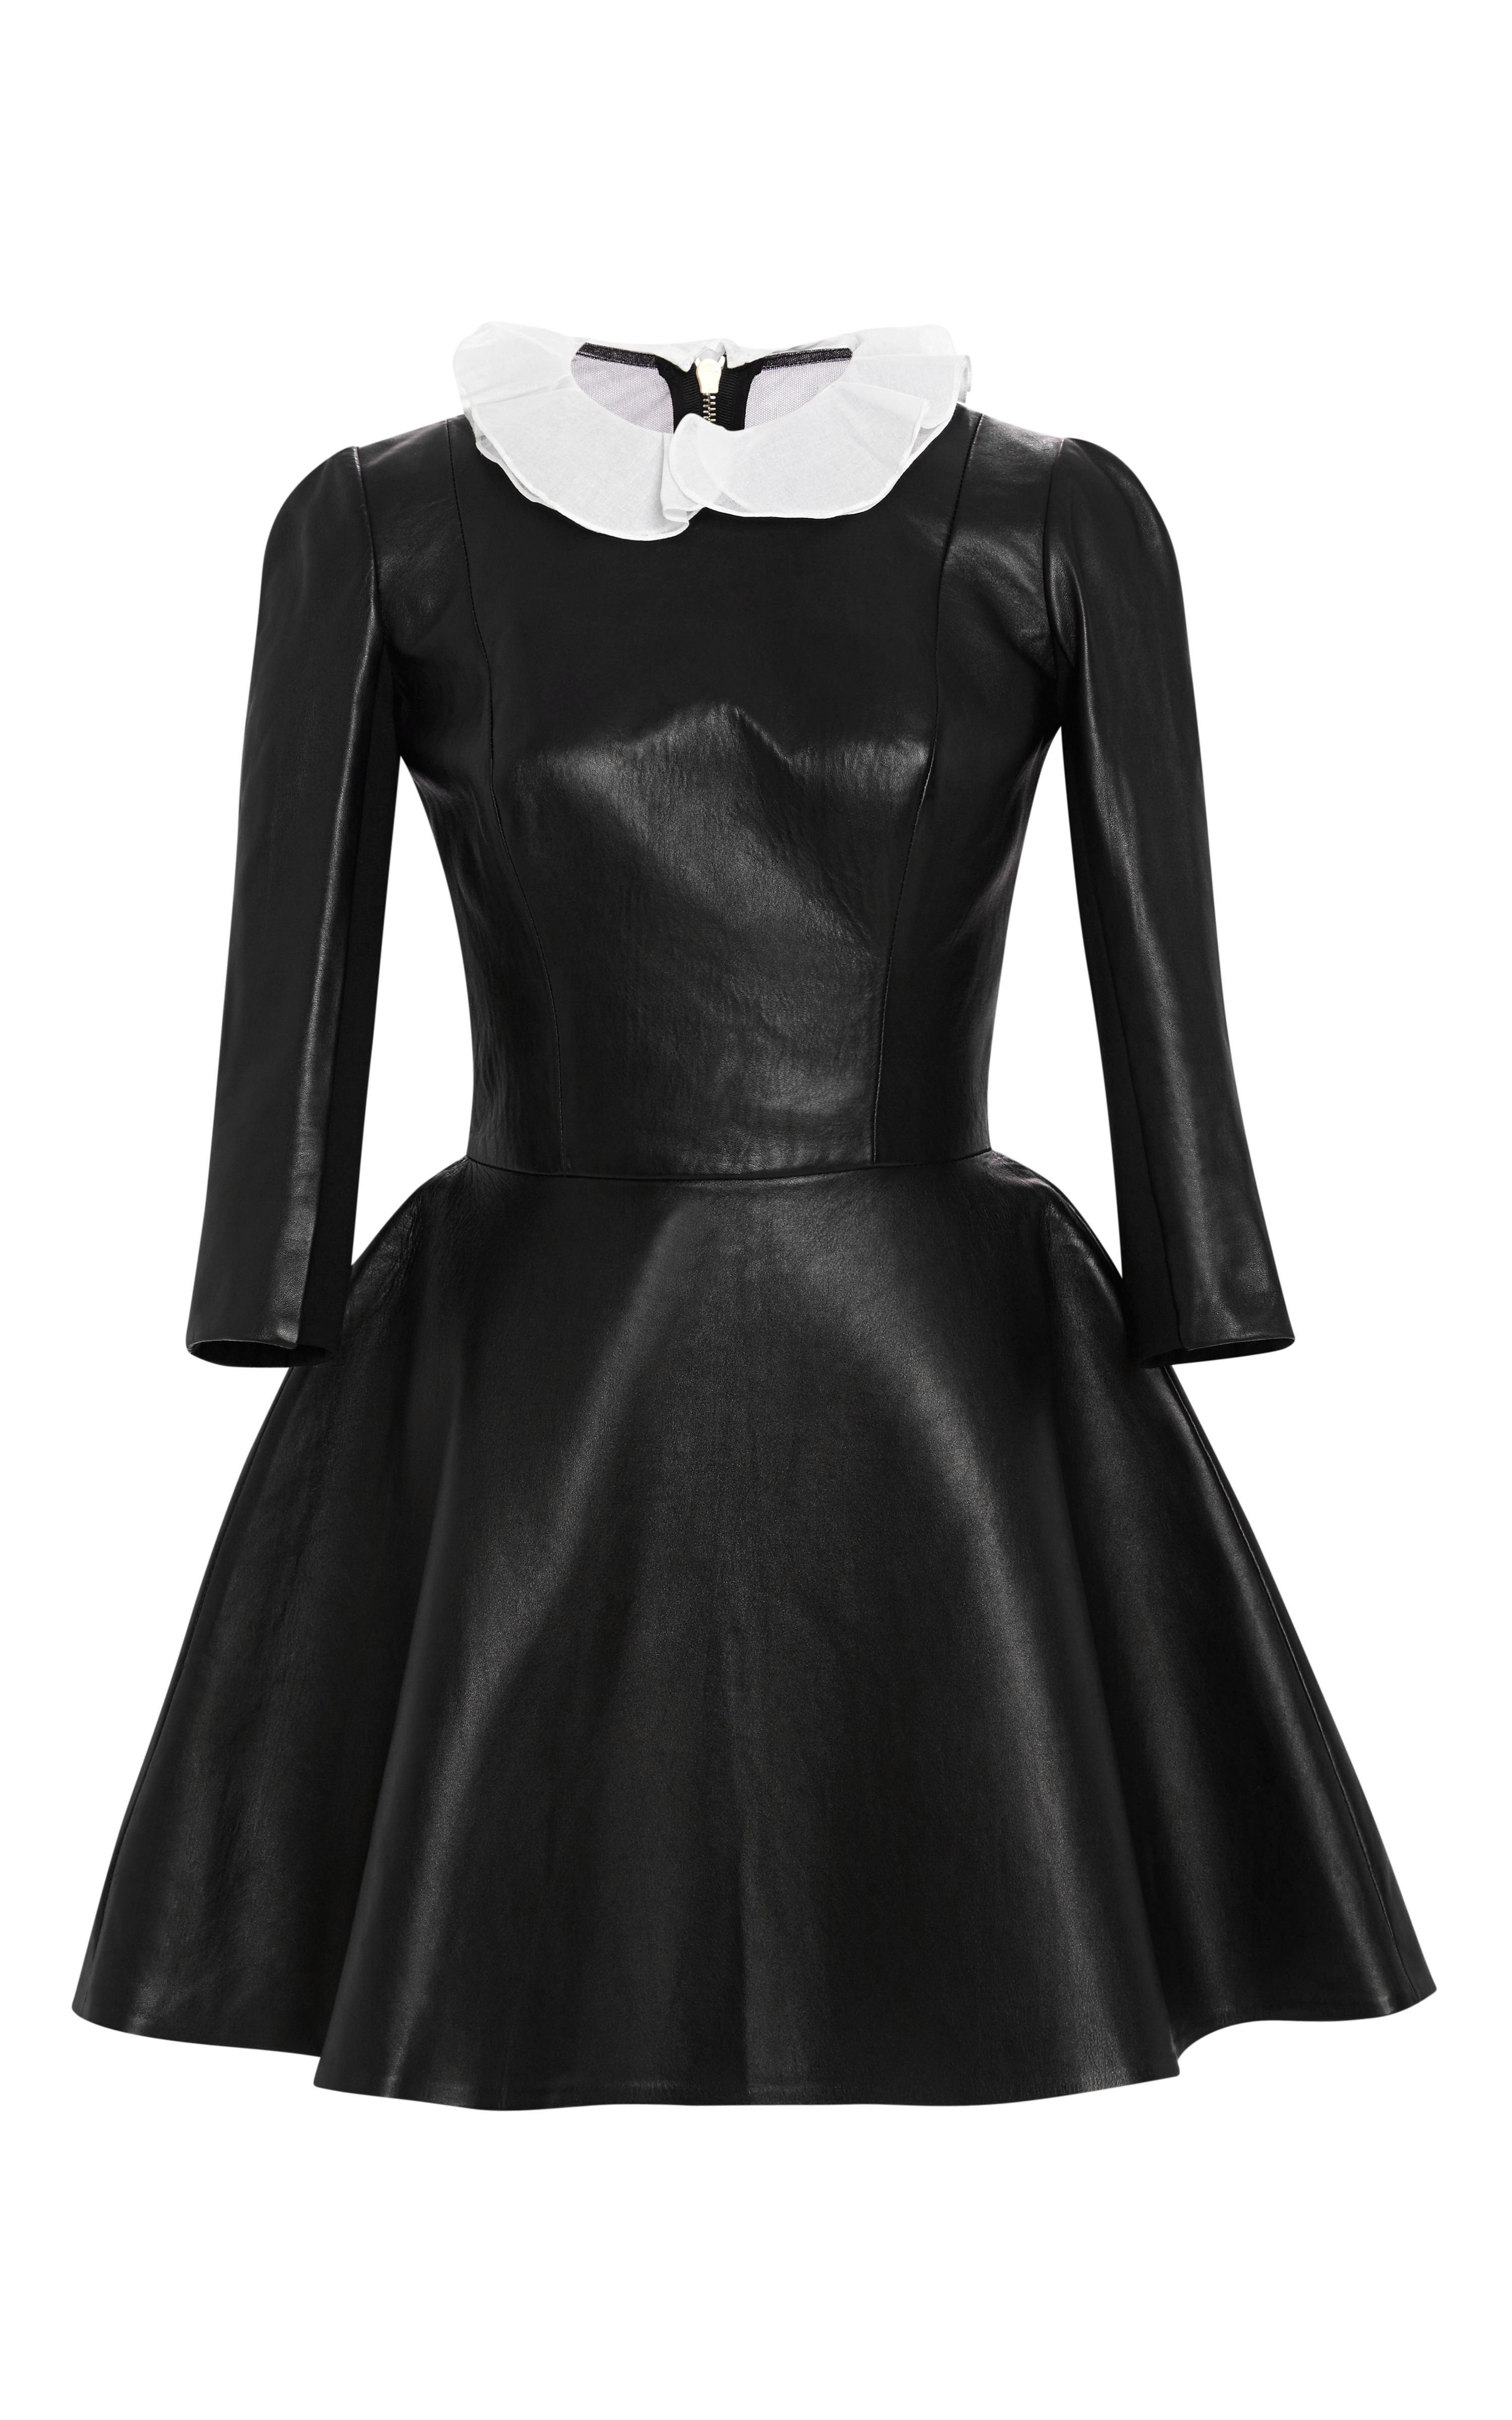 Lyst - Natasha Zinko Leather Dress in Black